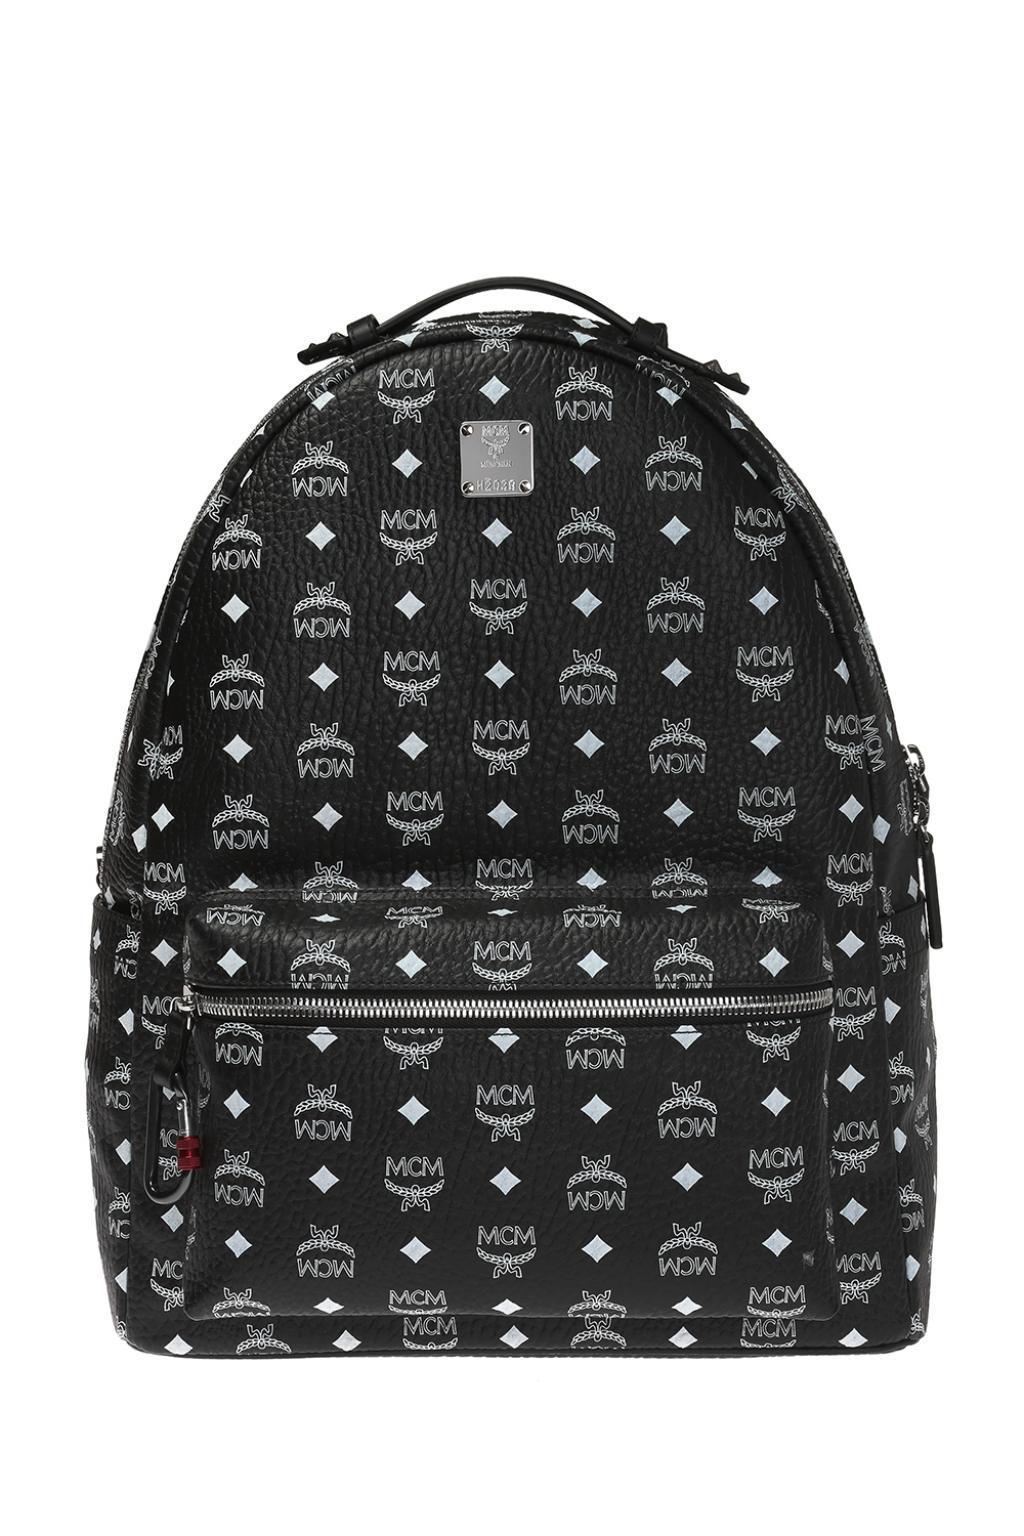 Lyst - MCM  stark  Backpack in Black for Men - Save 3% c1a4c2826fd7c